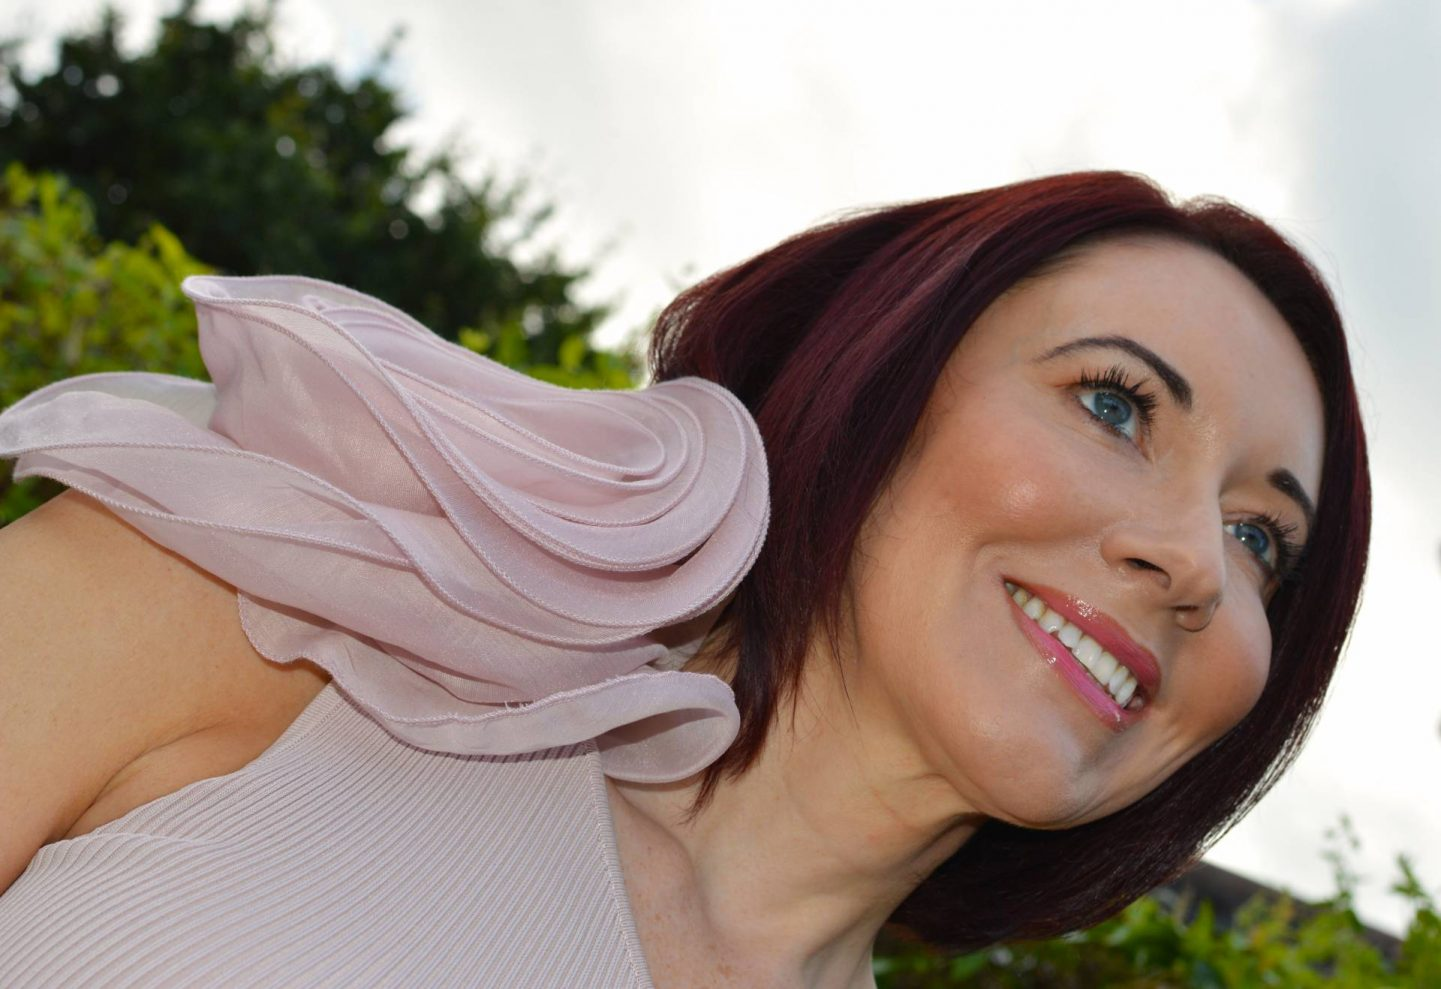 Zara Pink One Shoulder Corsage Top